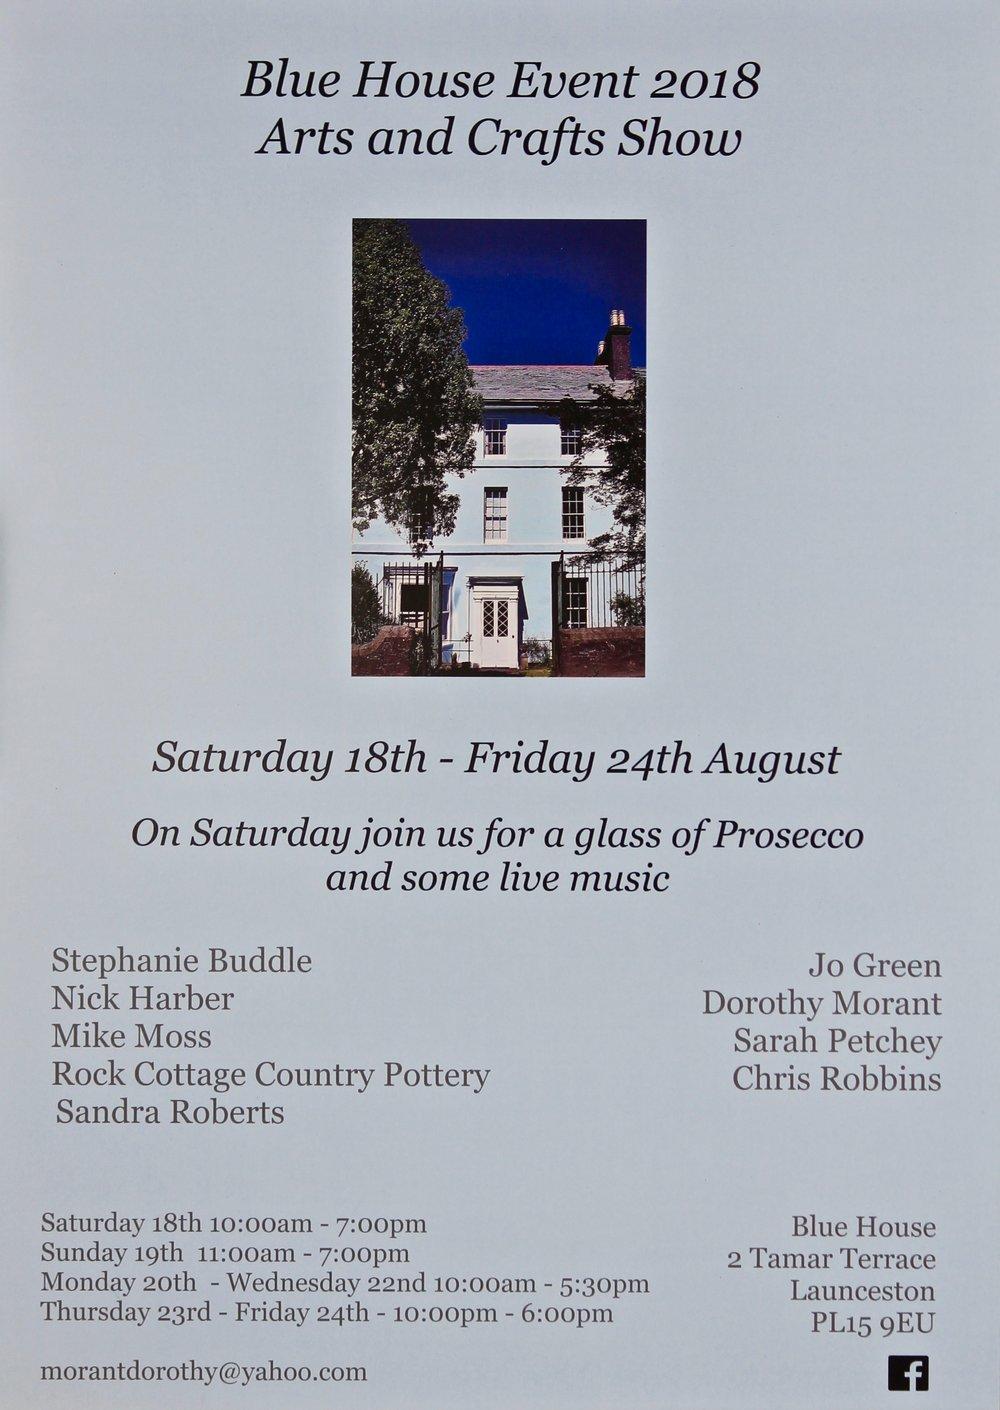 Blue House Event 2018 Poster.jpg